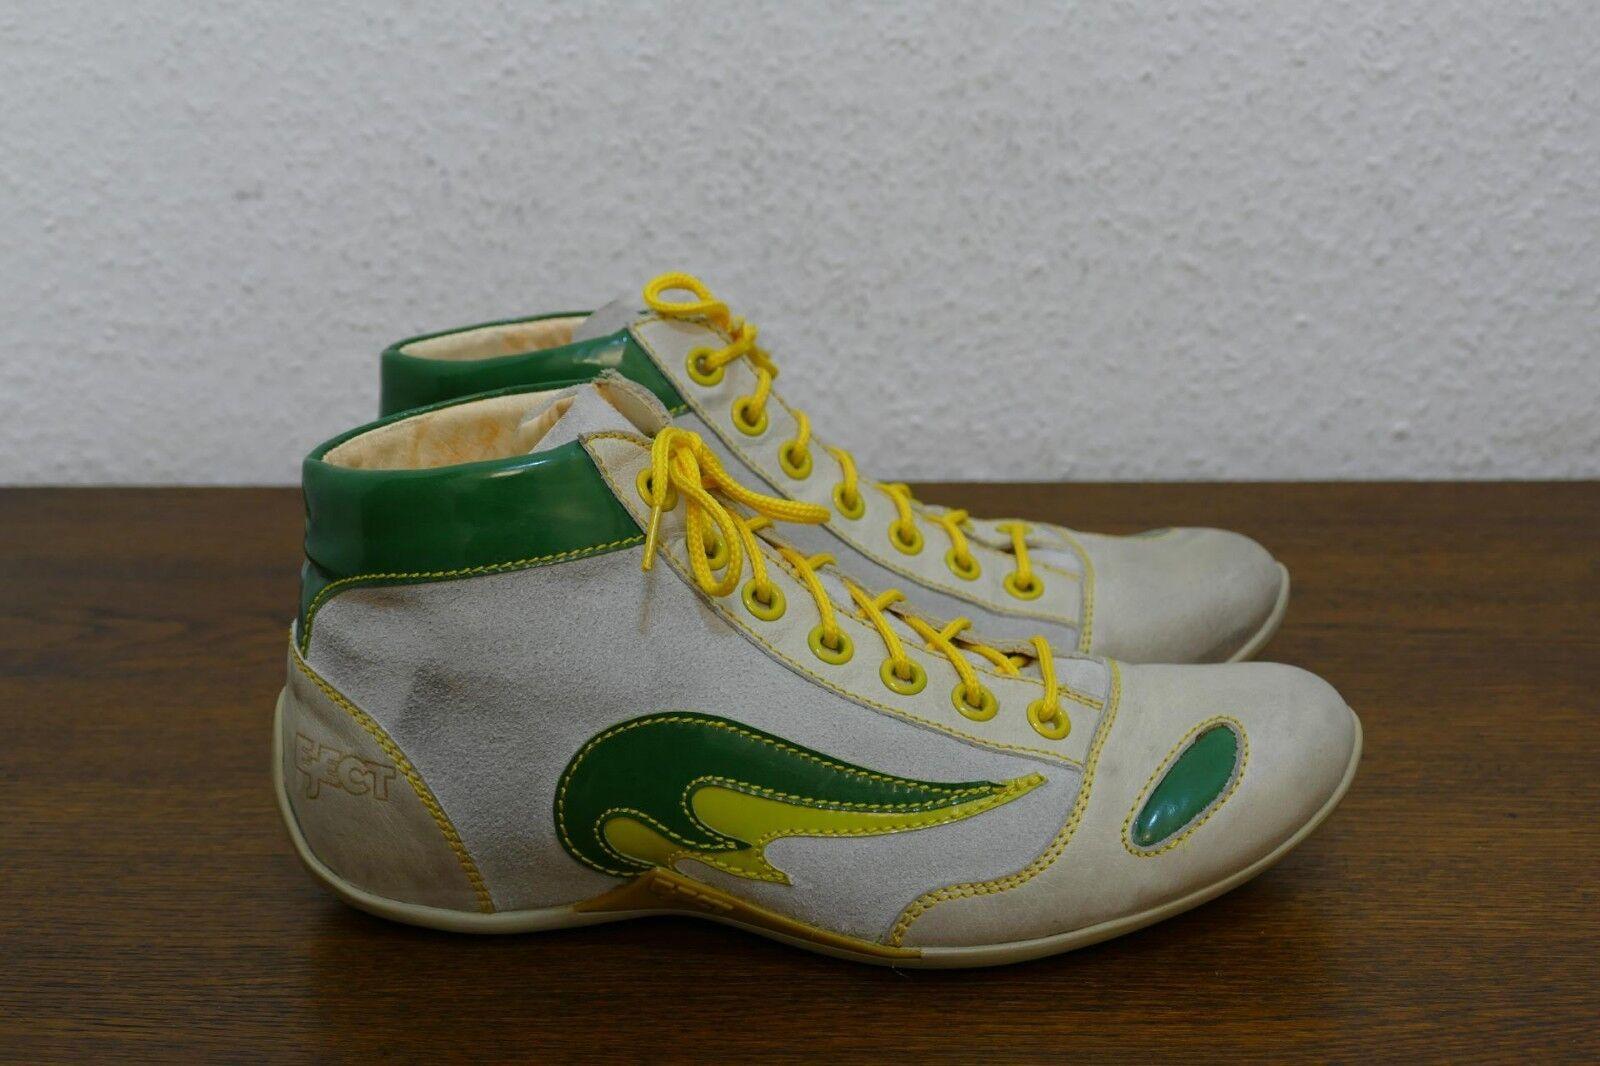 low priced e9d53 5d5b6 Nike Air Jordan 11 Low Cherry Red Size 8 XI XI XI White Varsity 528895-102  684cfa